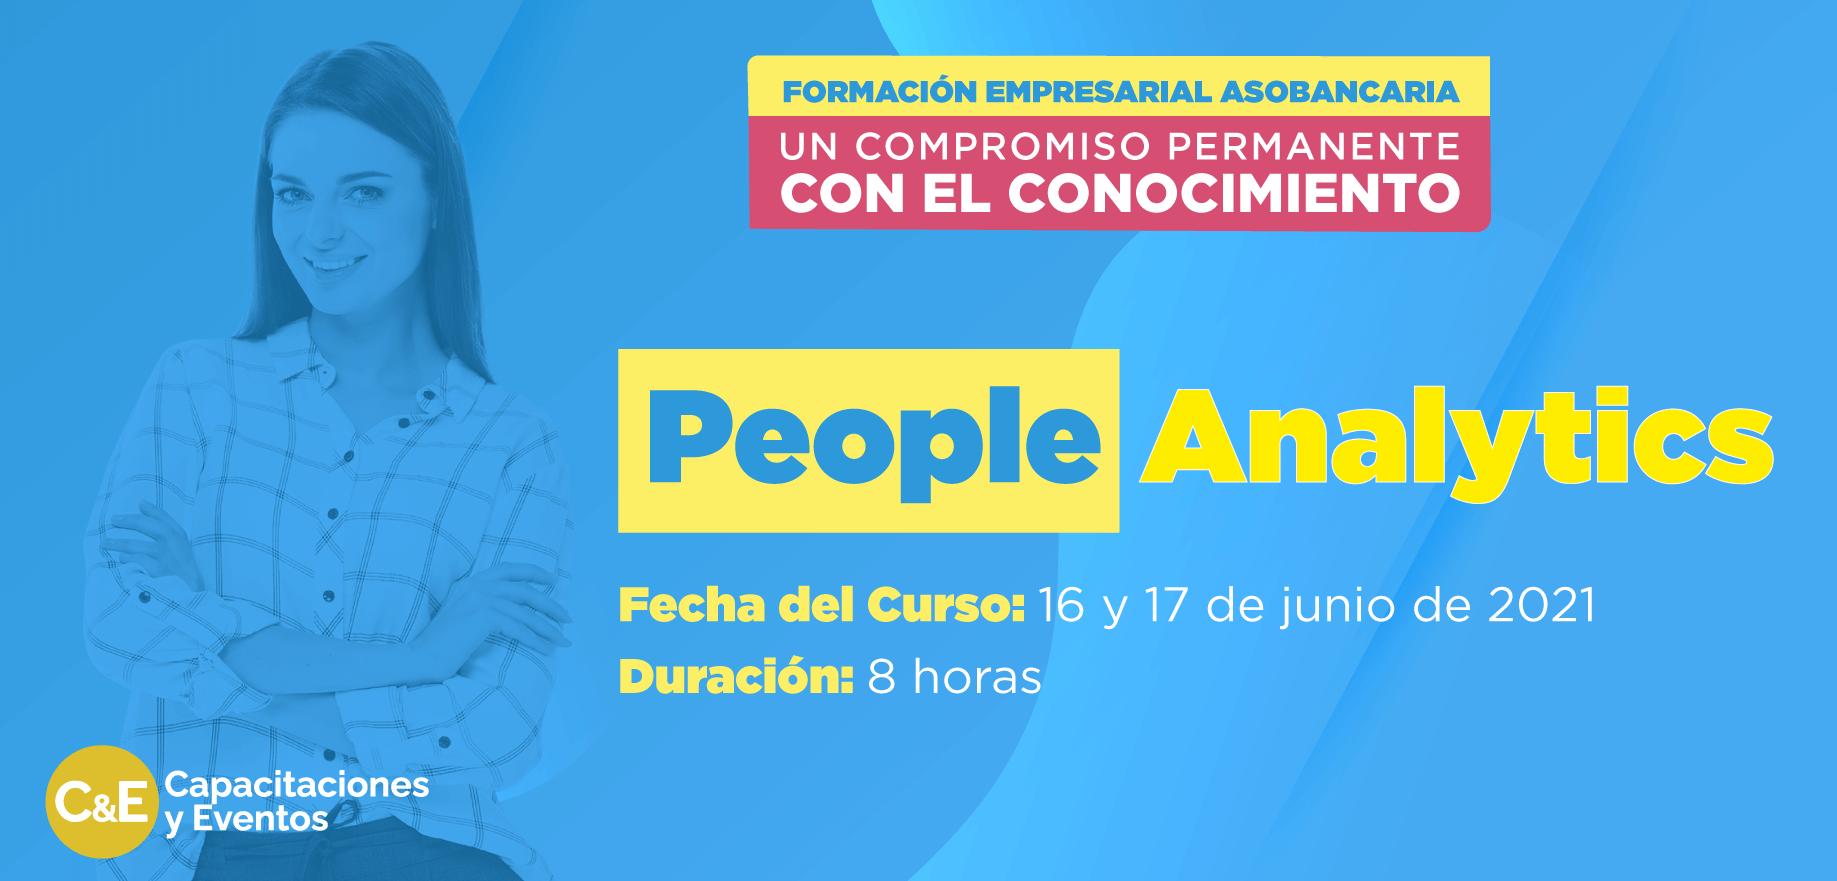 capactacion people analytics - asobancaria